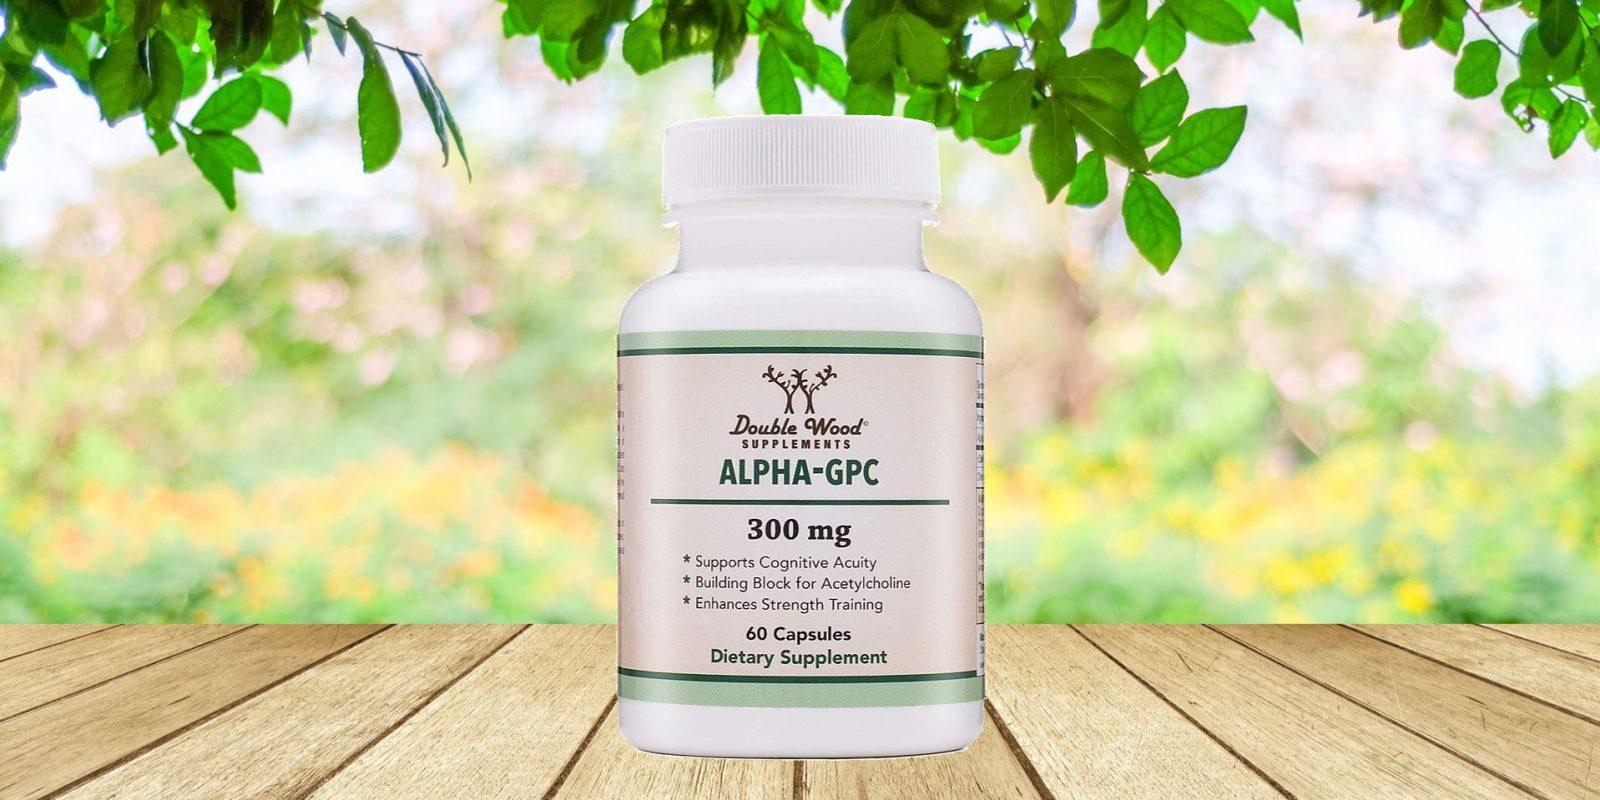 Double Wood Alpha- GPC